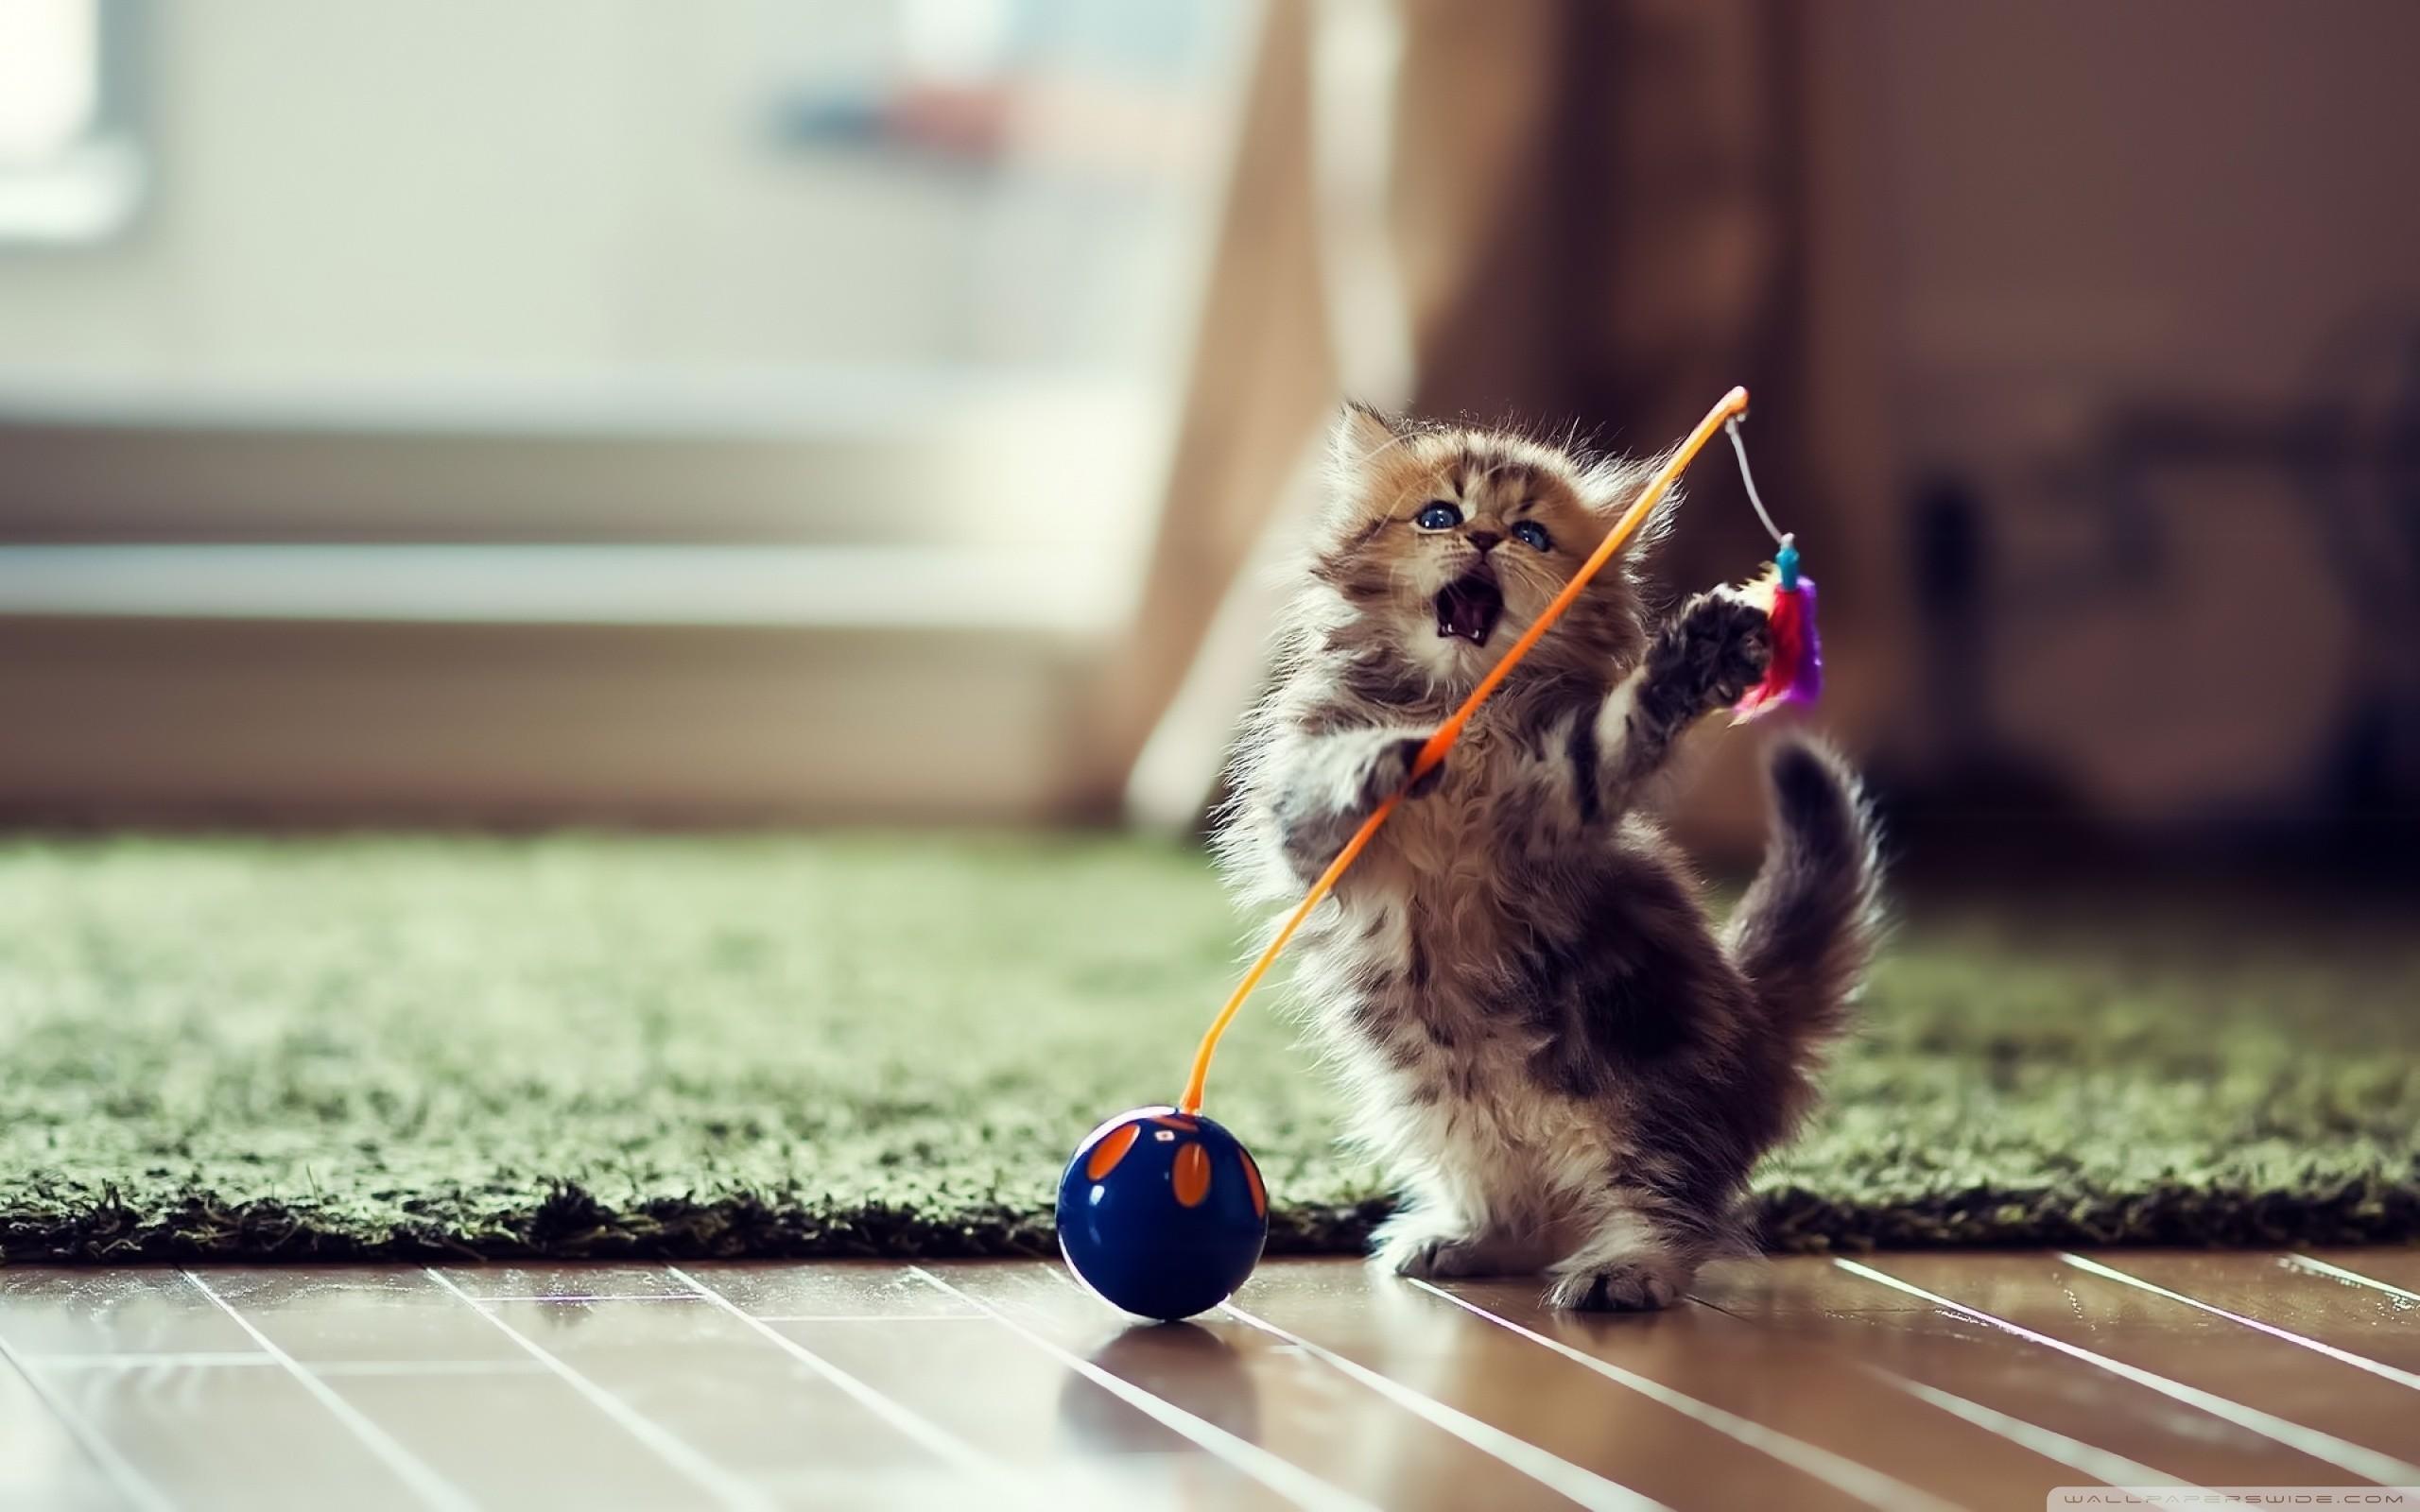 … kittens wallpapers photos and desktop backgrounds for mobile up; dancer  cat hd desktop wallpaper high definition fullscreen …